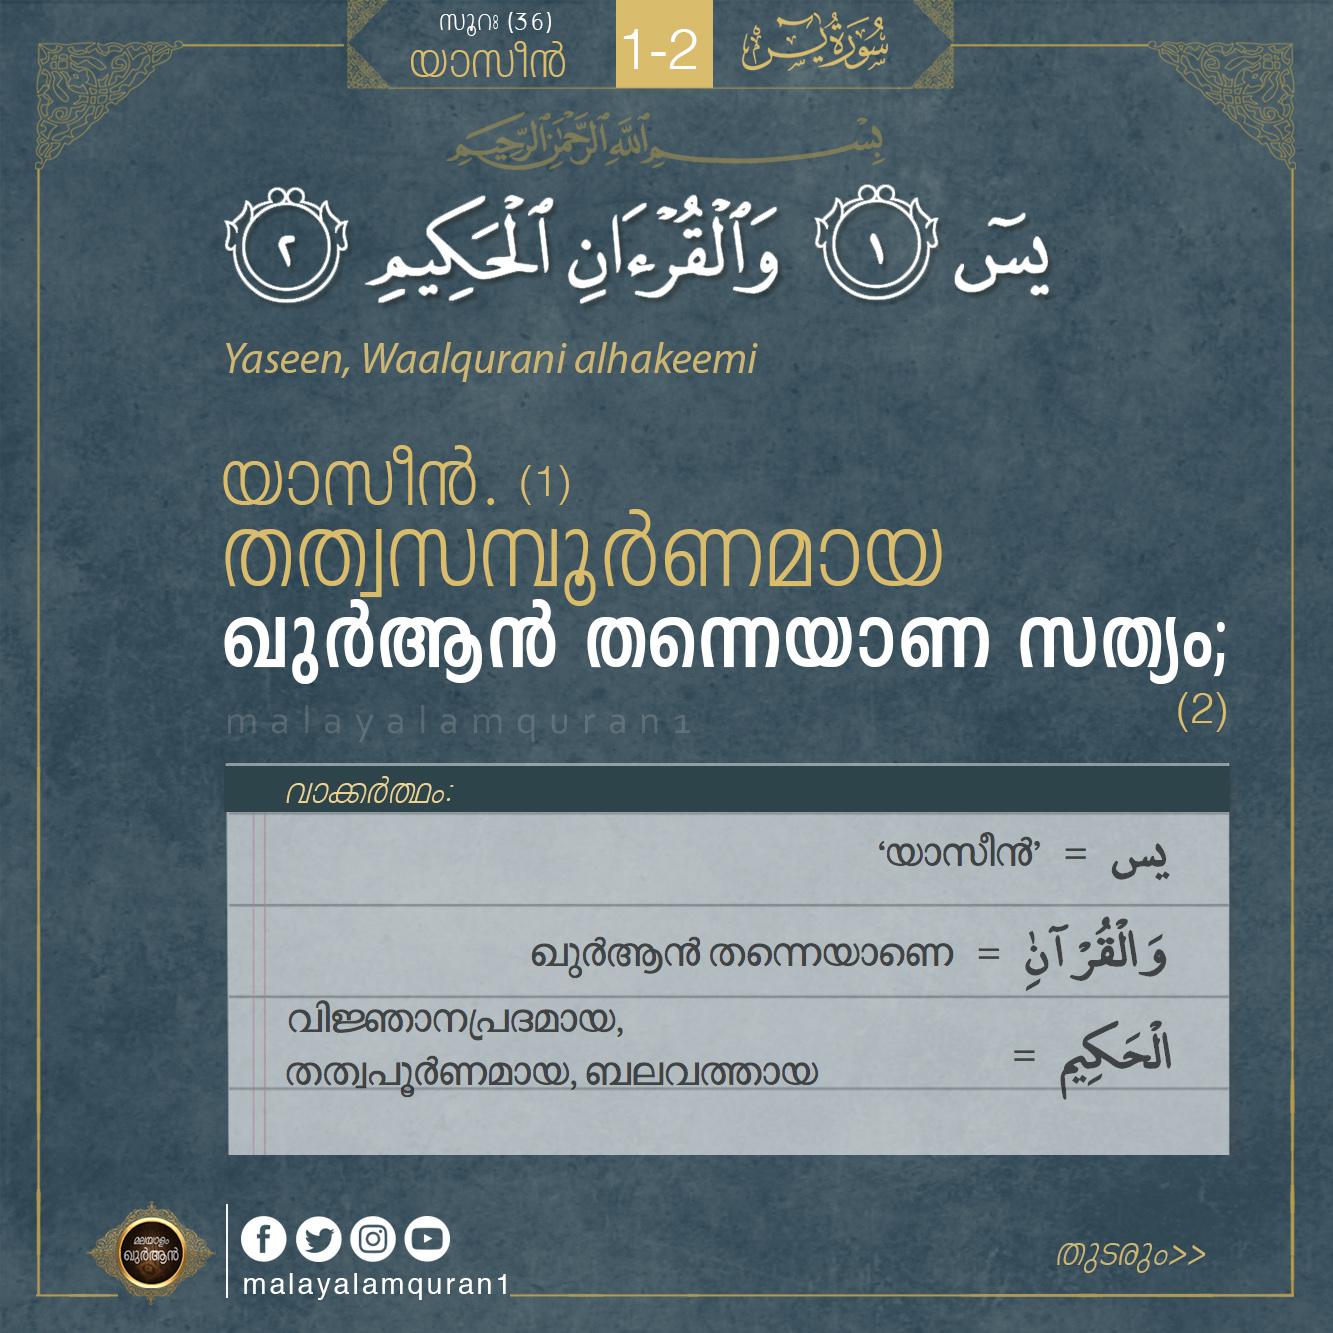 Malayalam Quran - മലയാളം ഖുർആൻ: July 2017